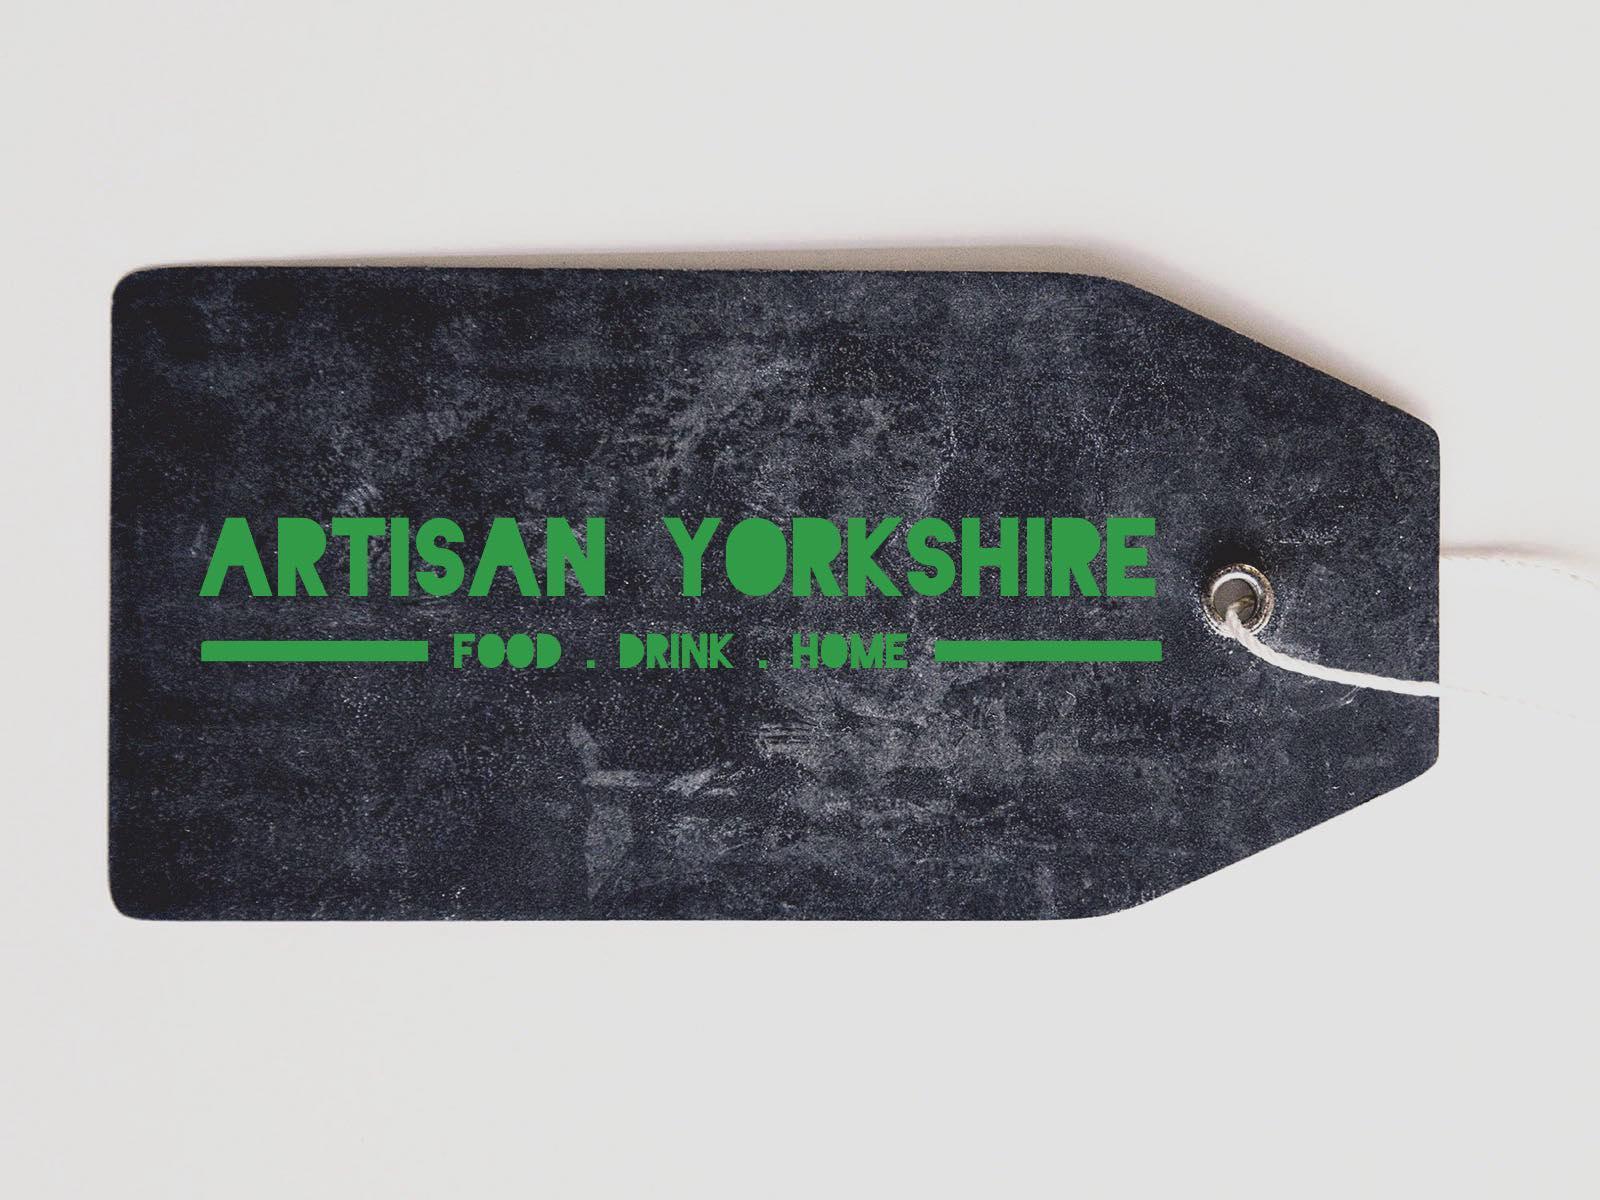 Artisan Yorkshire